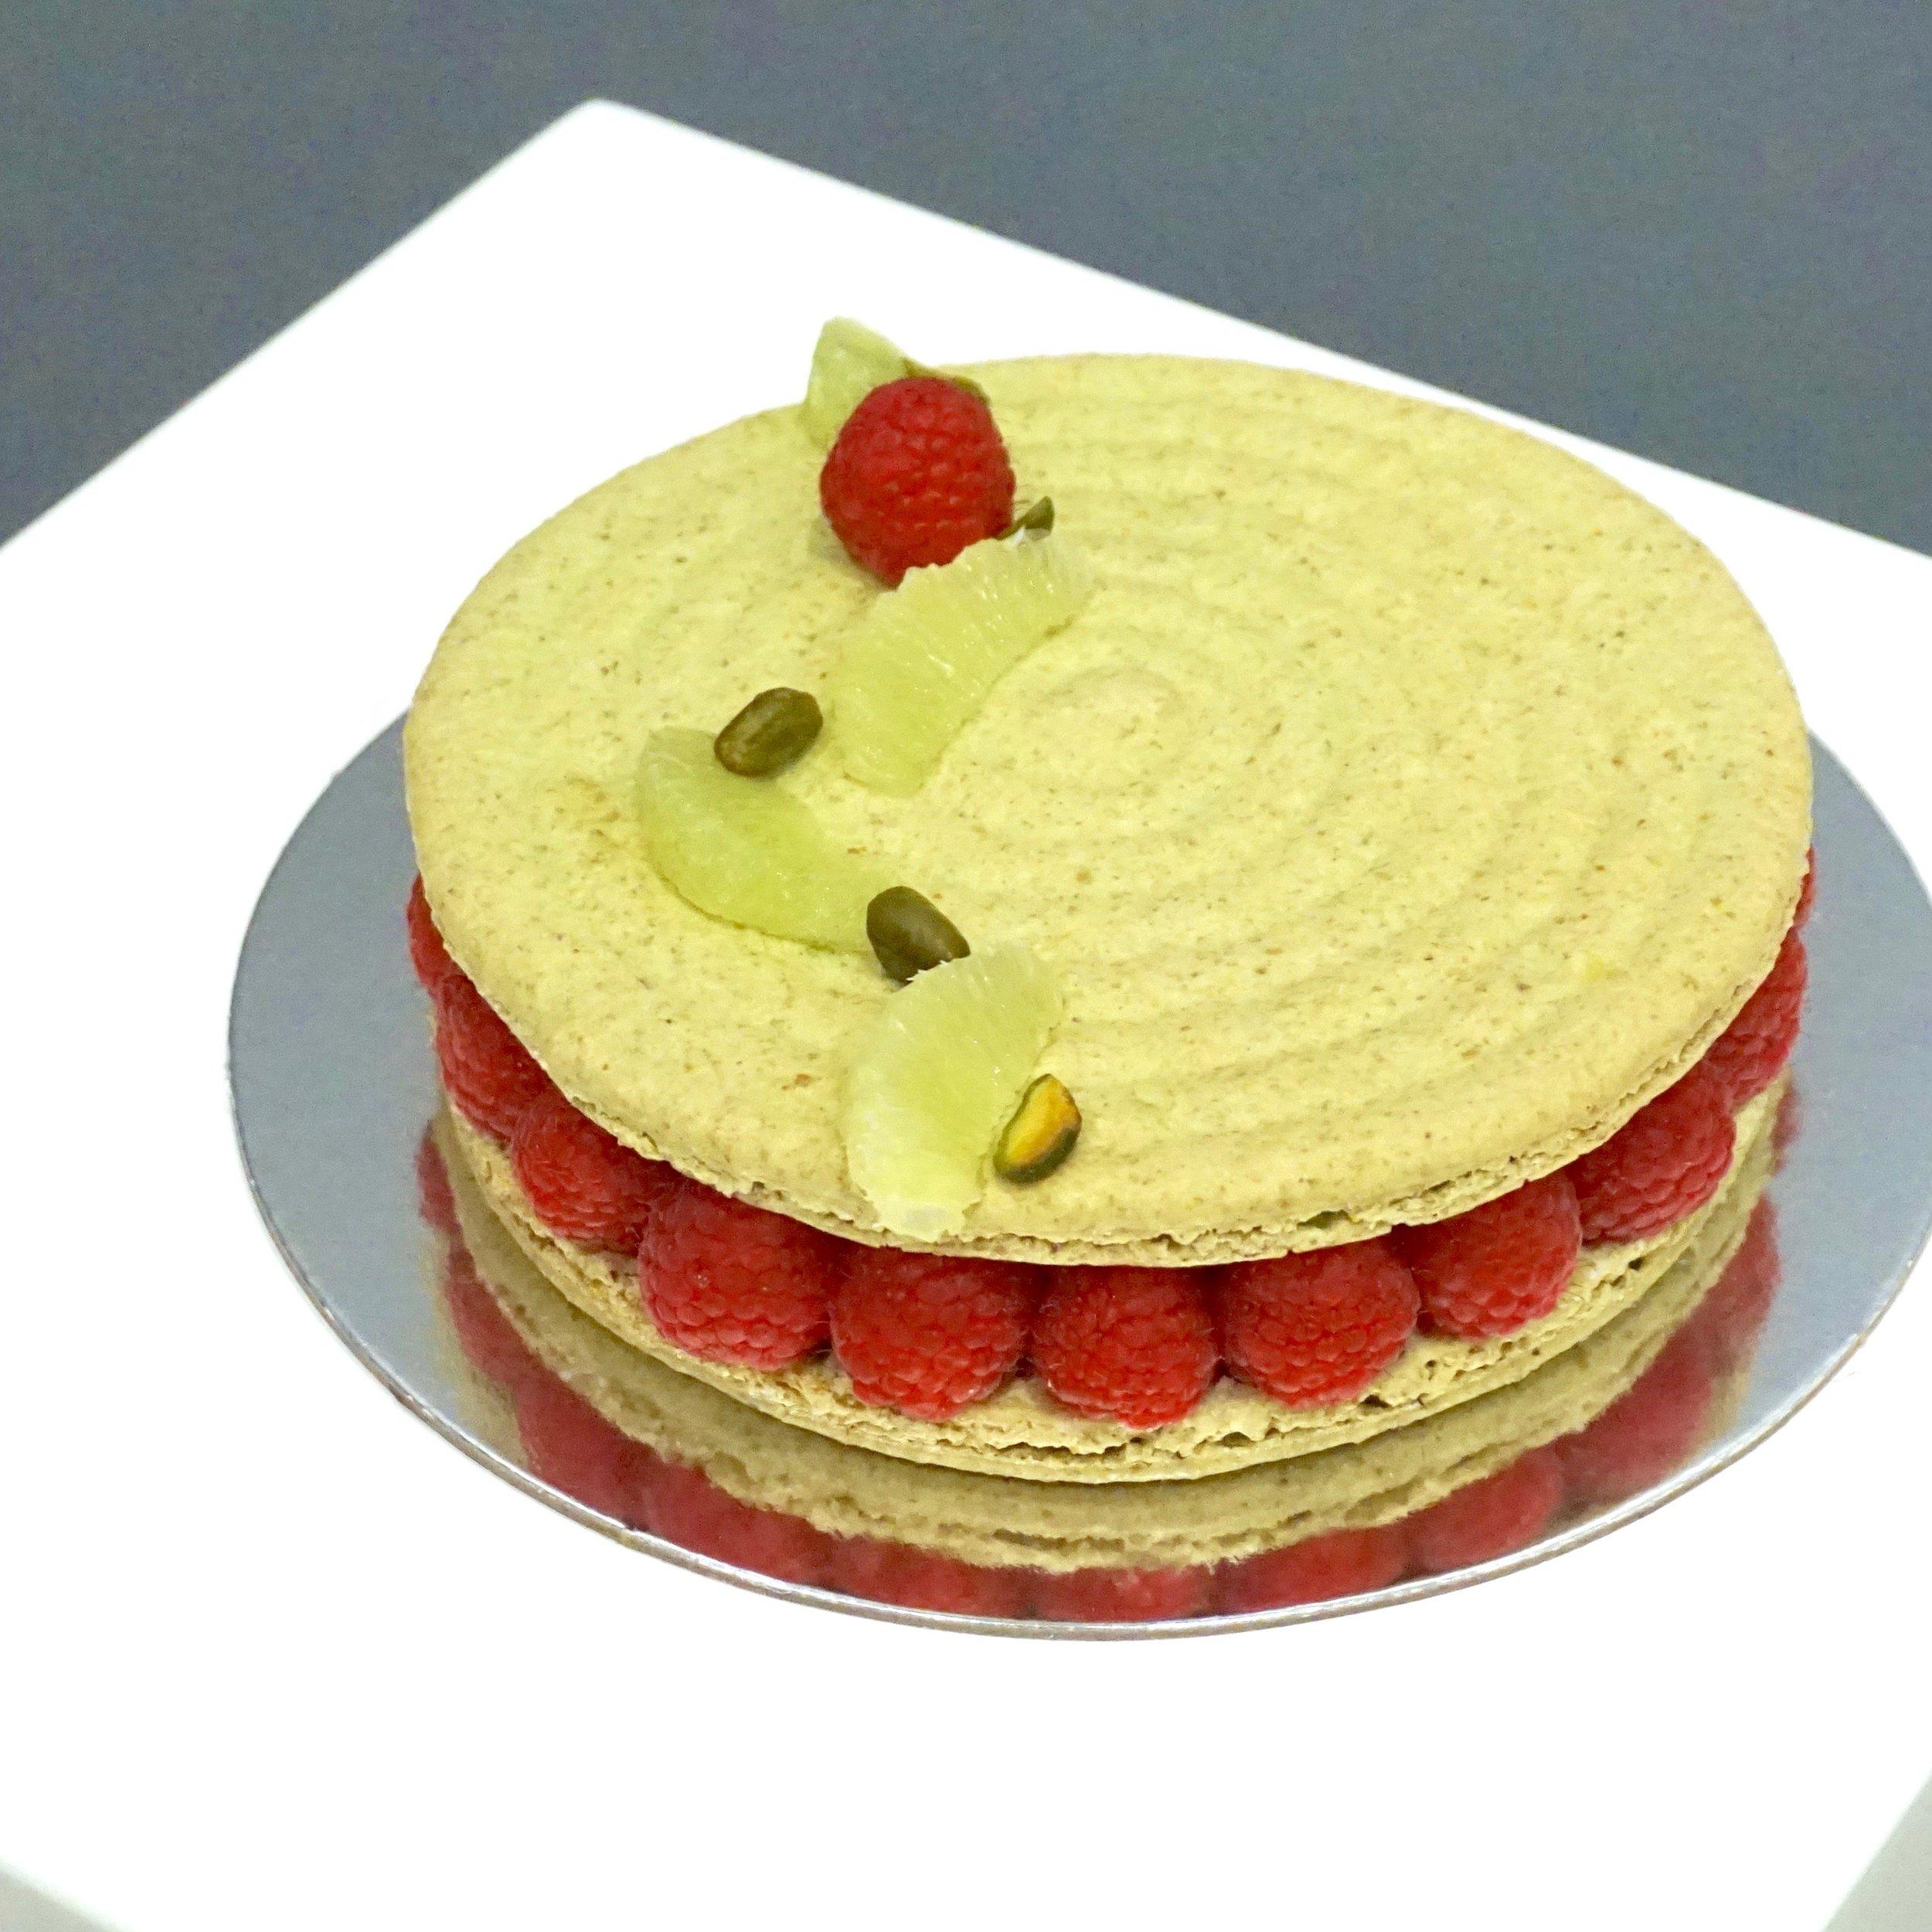 Macaron Cake Pistachio Lime Raspberry.jpg